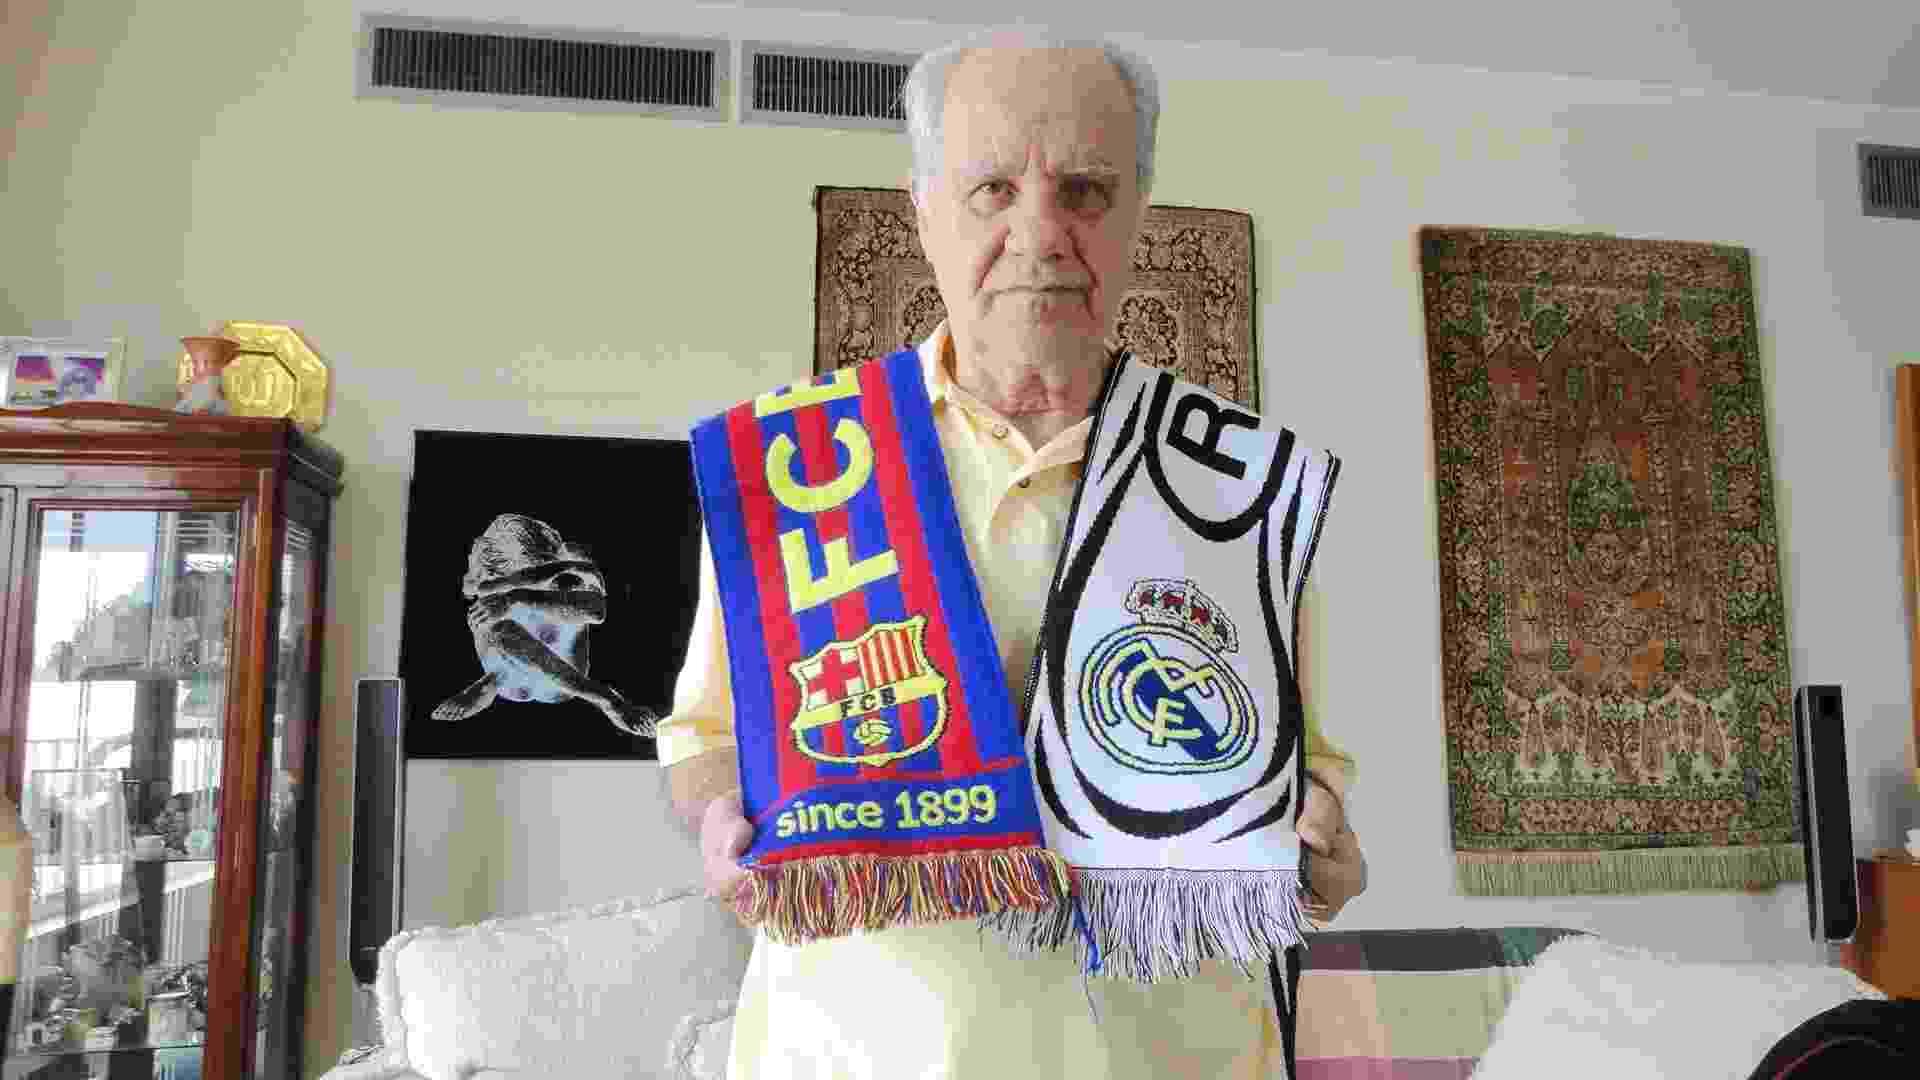 Evaristo de Macedo, ídolo dos rivais Barcelona e Real Madrid - Vinicius Castro/ UOL Esporte